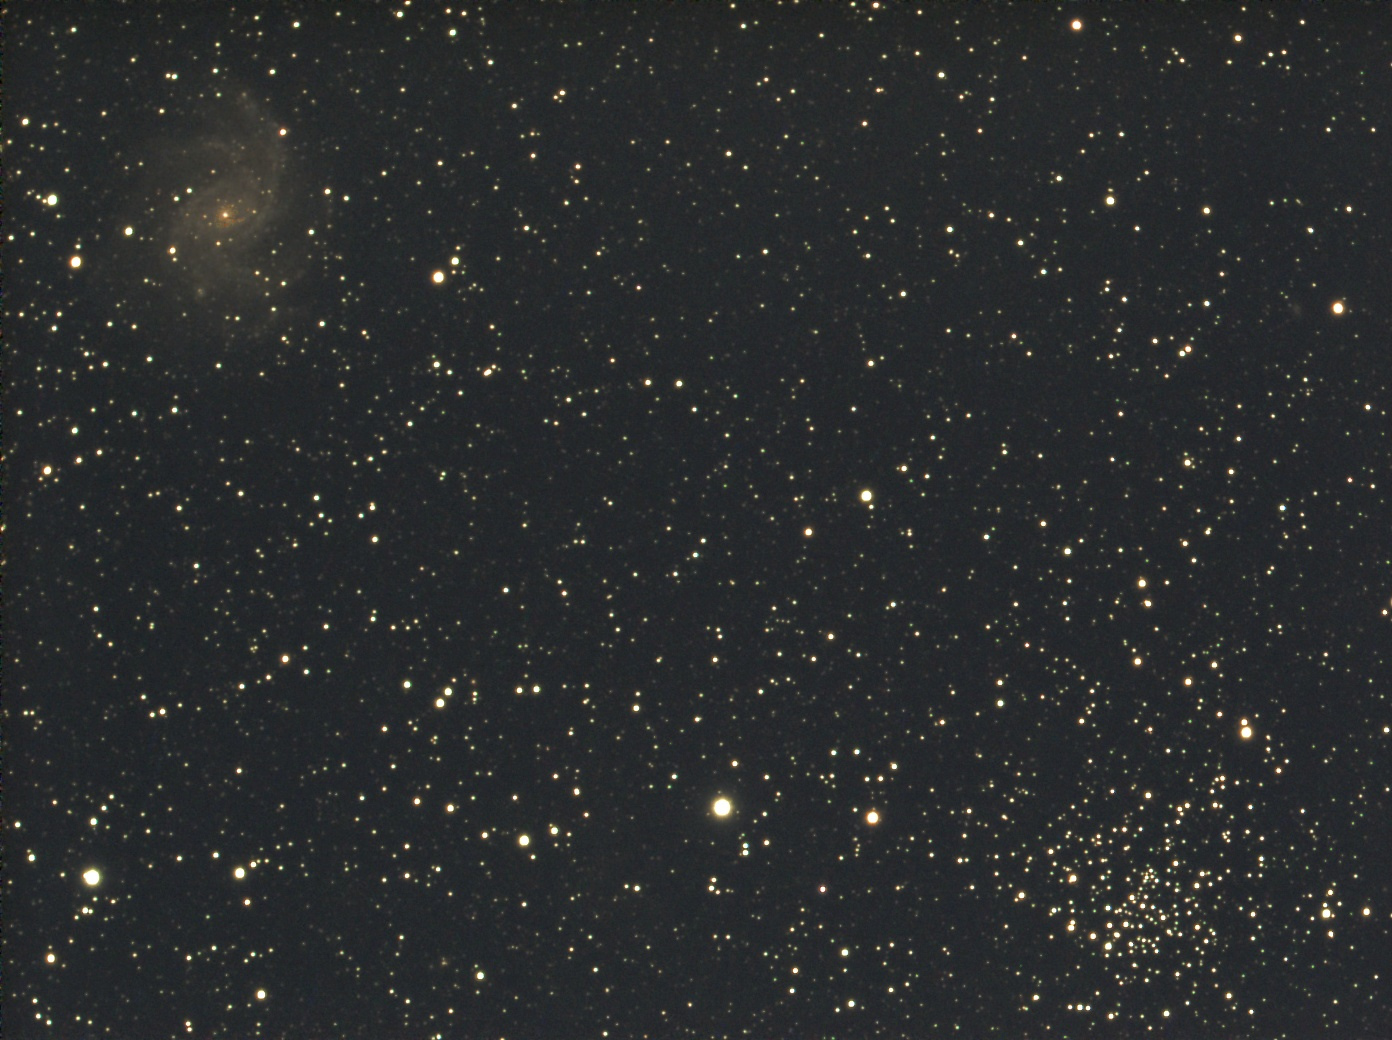 NGC6946 et 6939_40x20s_115perl reduc0.jpg